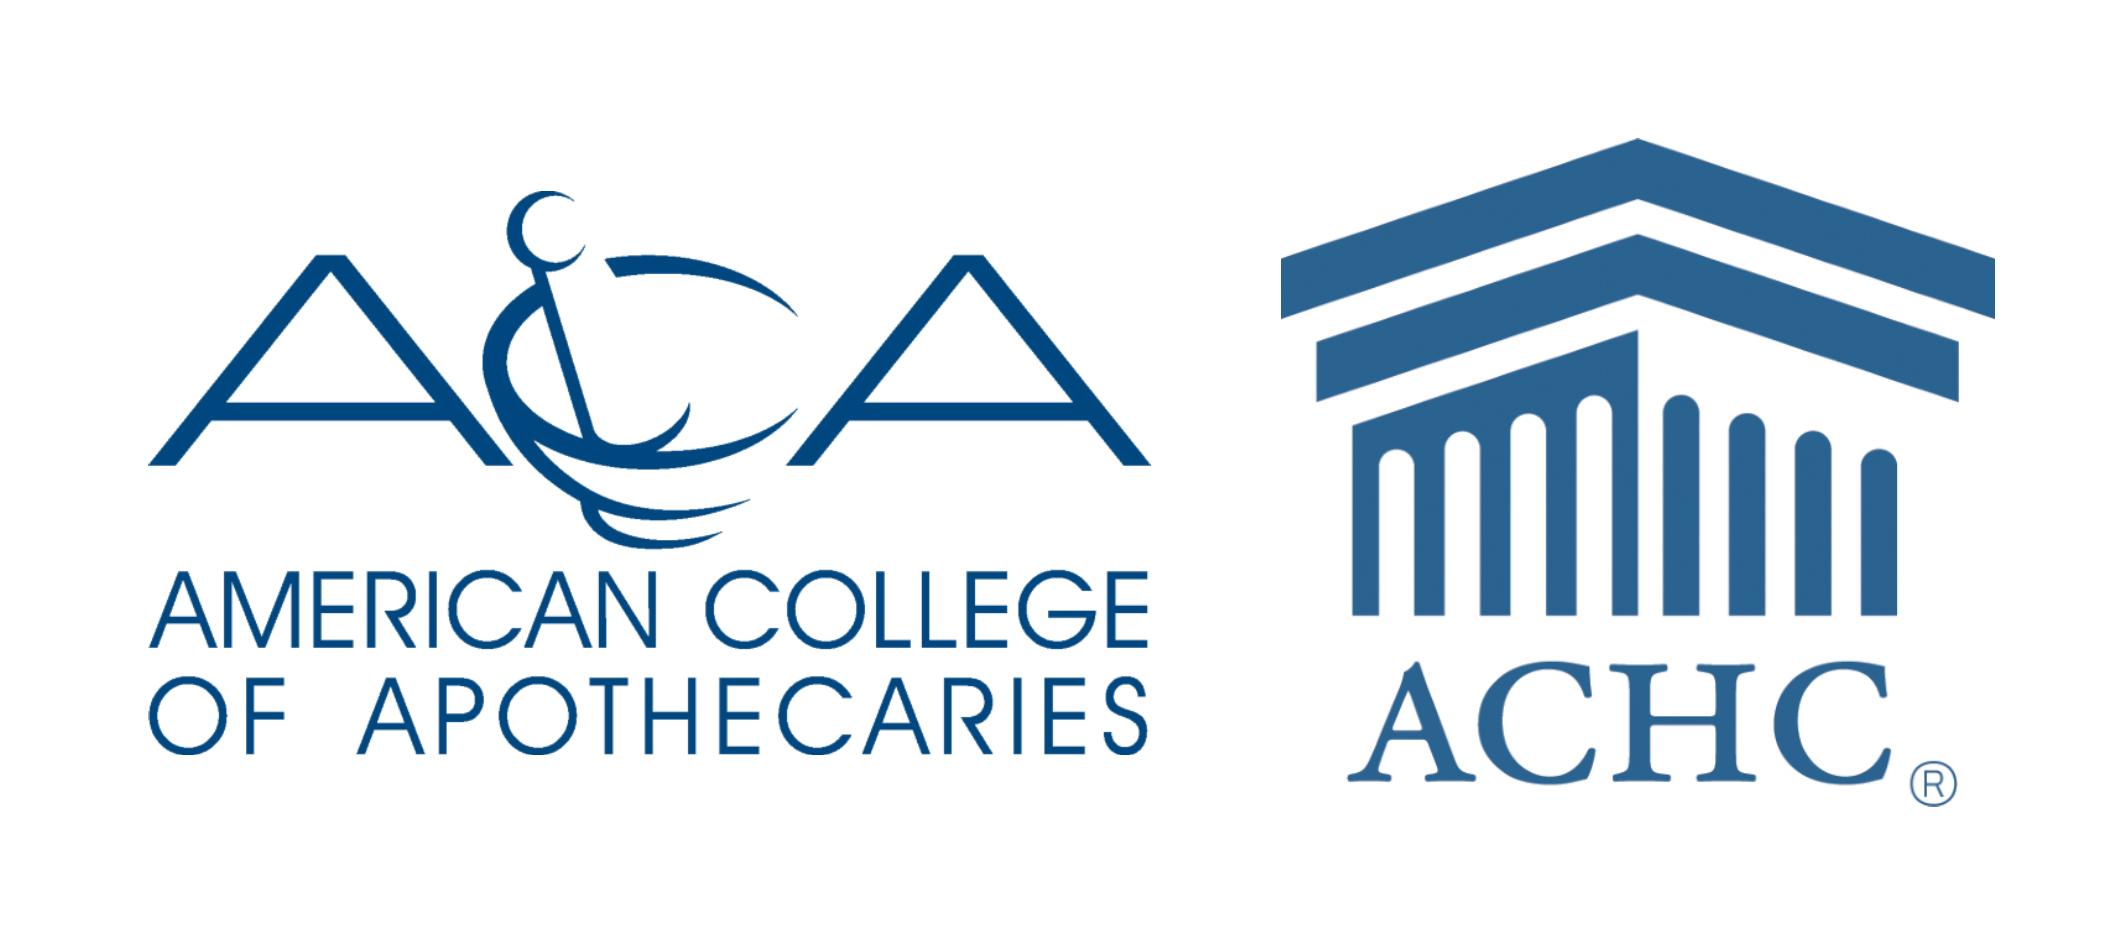 ACA - ACHC logos